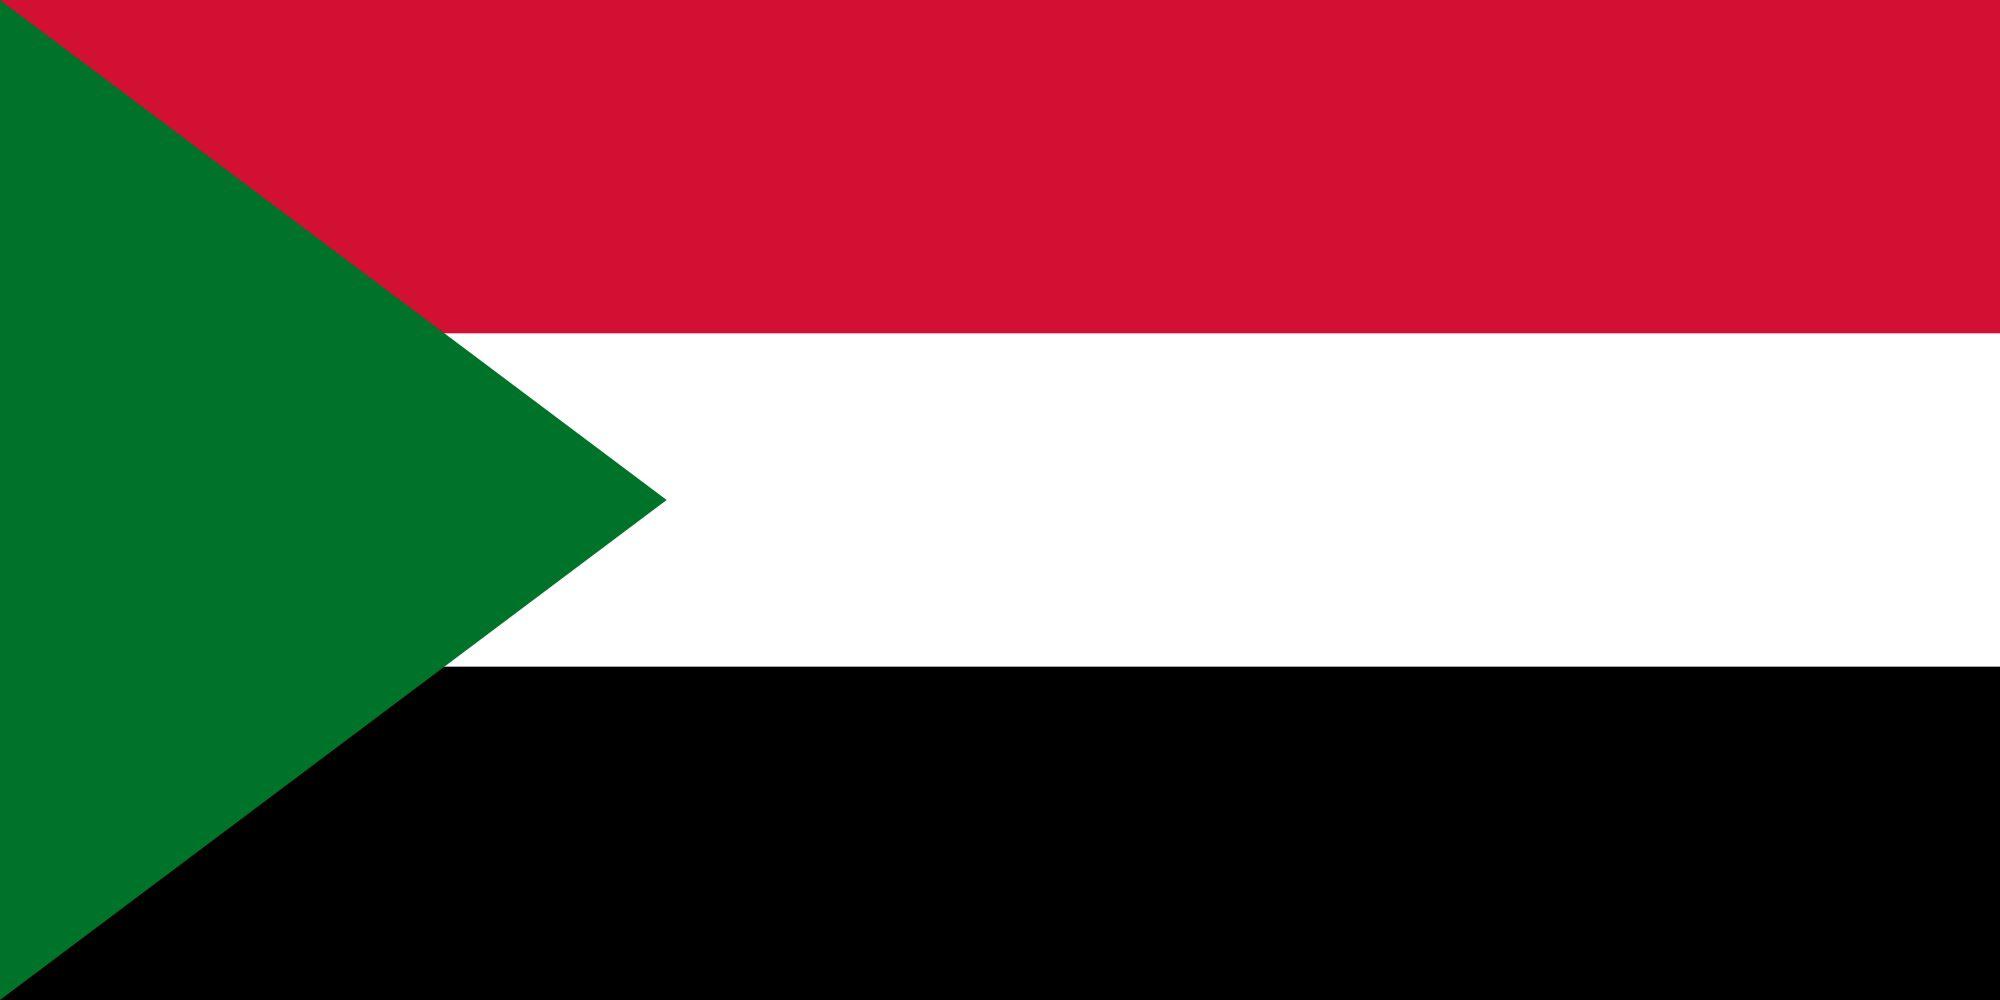 Drapeau Soudan - Le drapeau soudanais